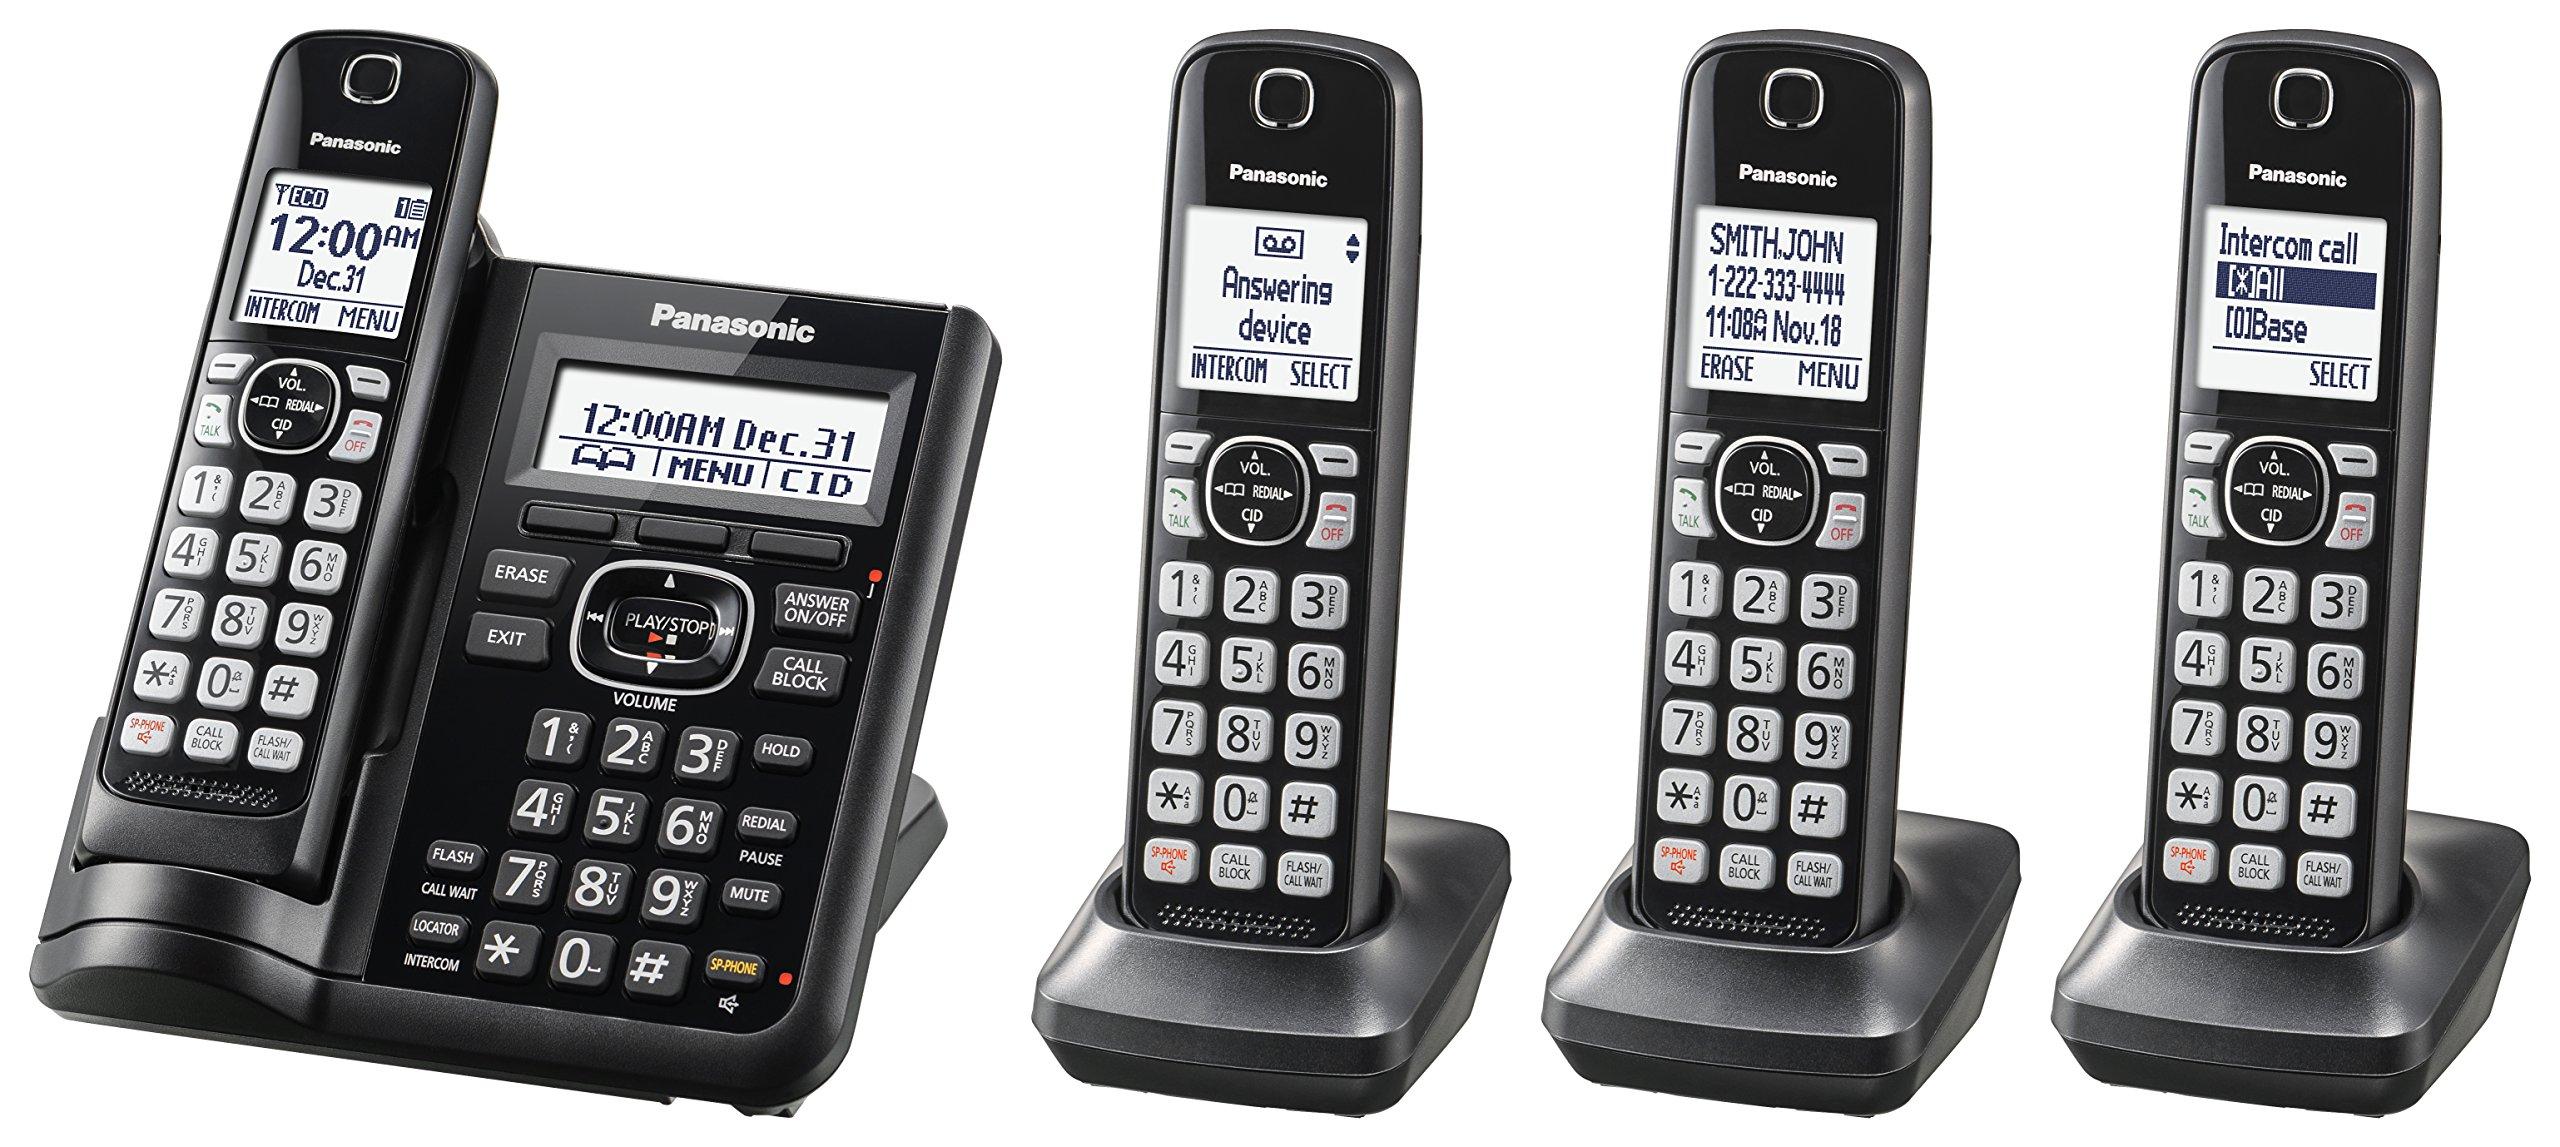 Panasonic KX-TGF544B Expandable Cordless Phone with Call Block and Answering Machine - 4 Handsets by Panasonic